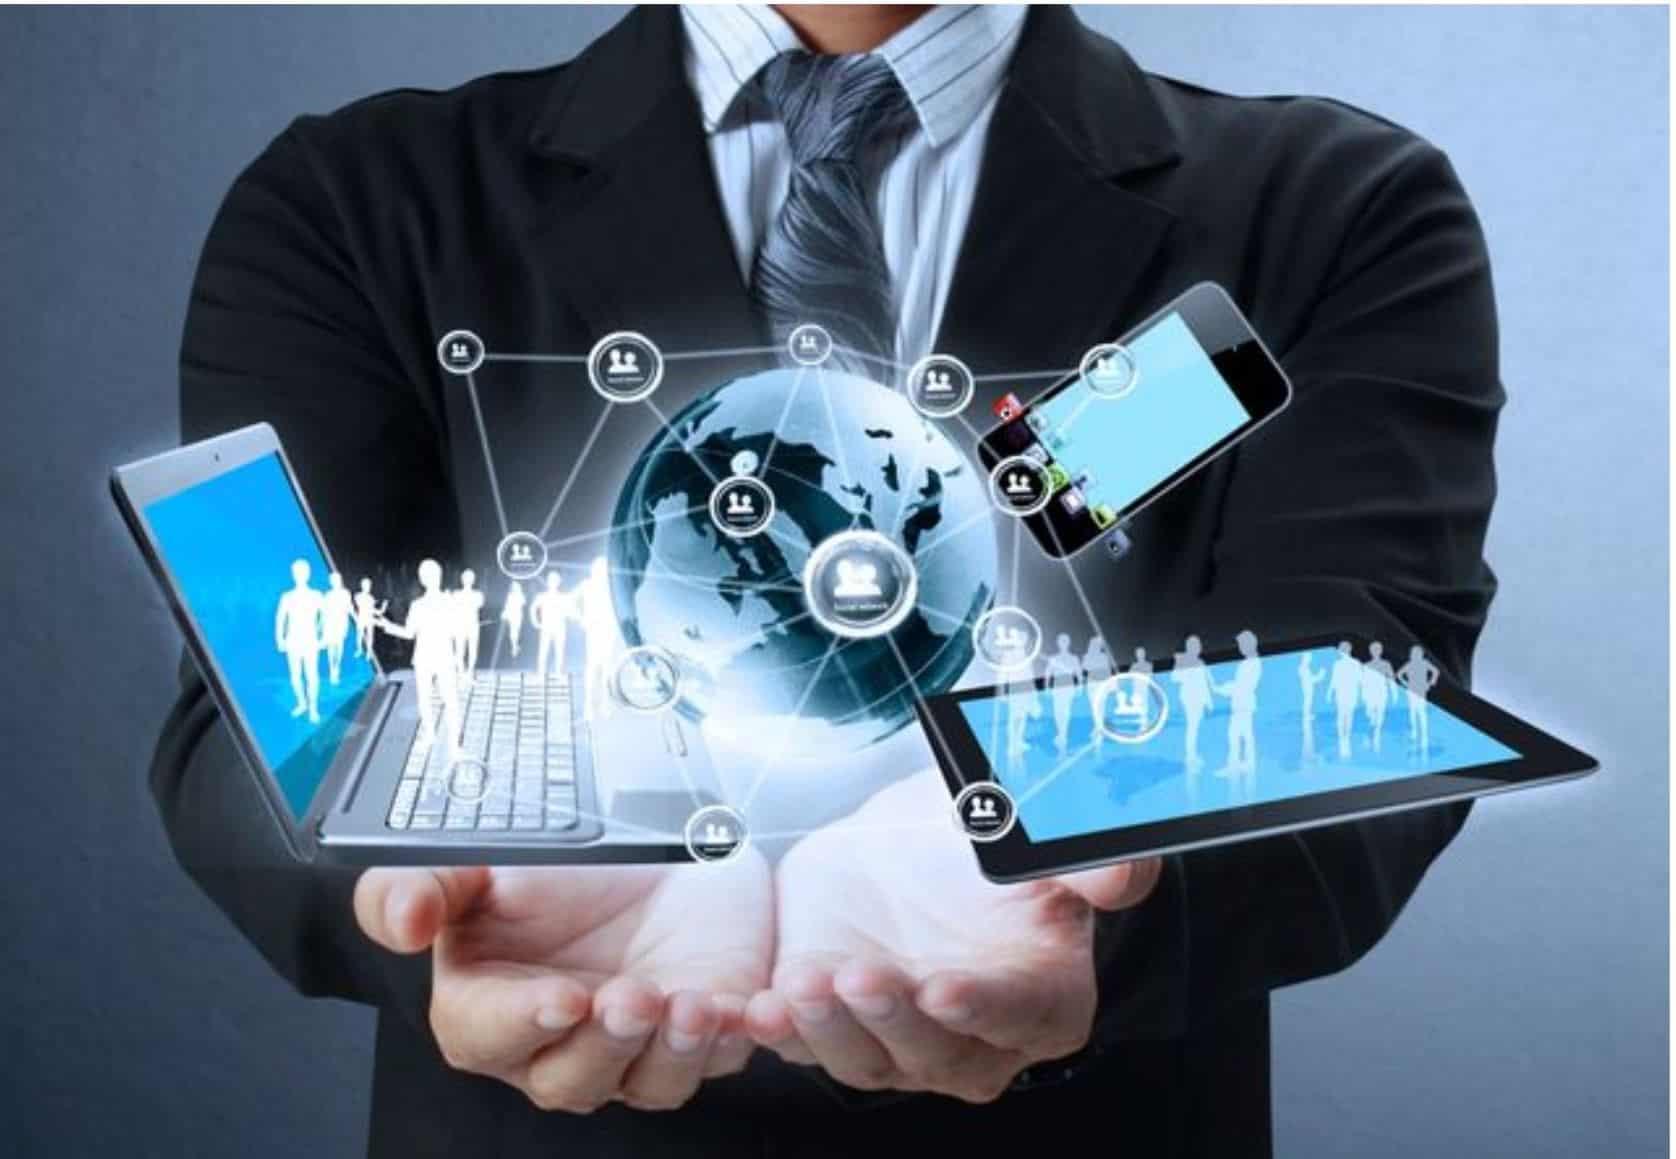 Company and professional digital communications